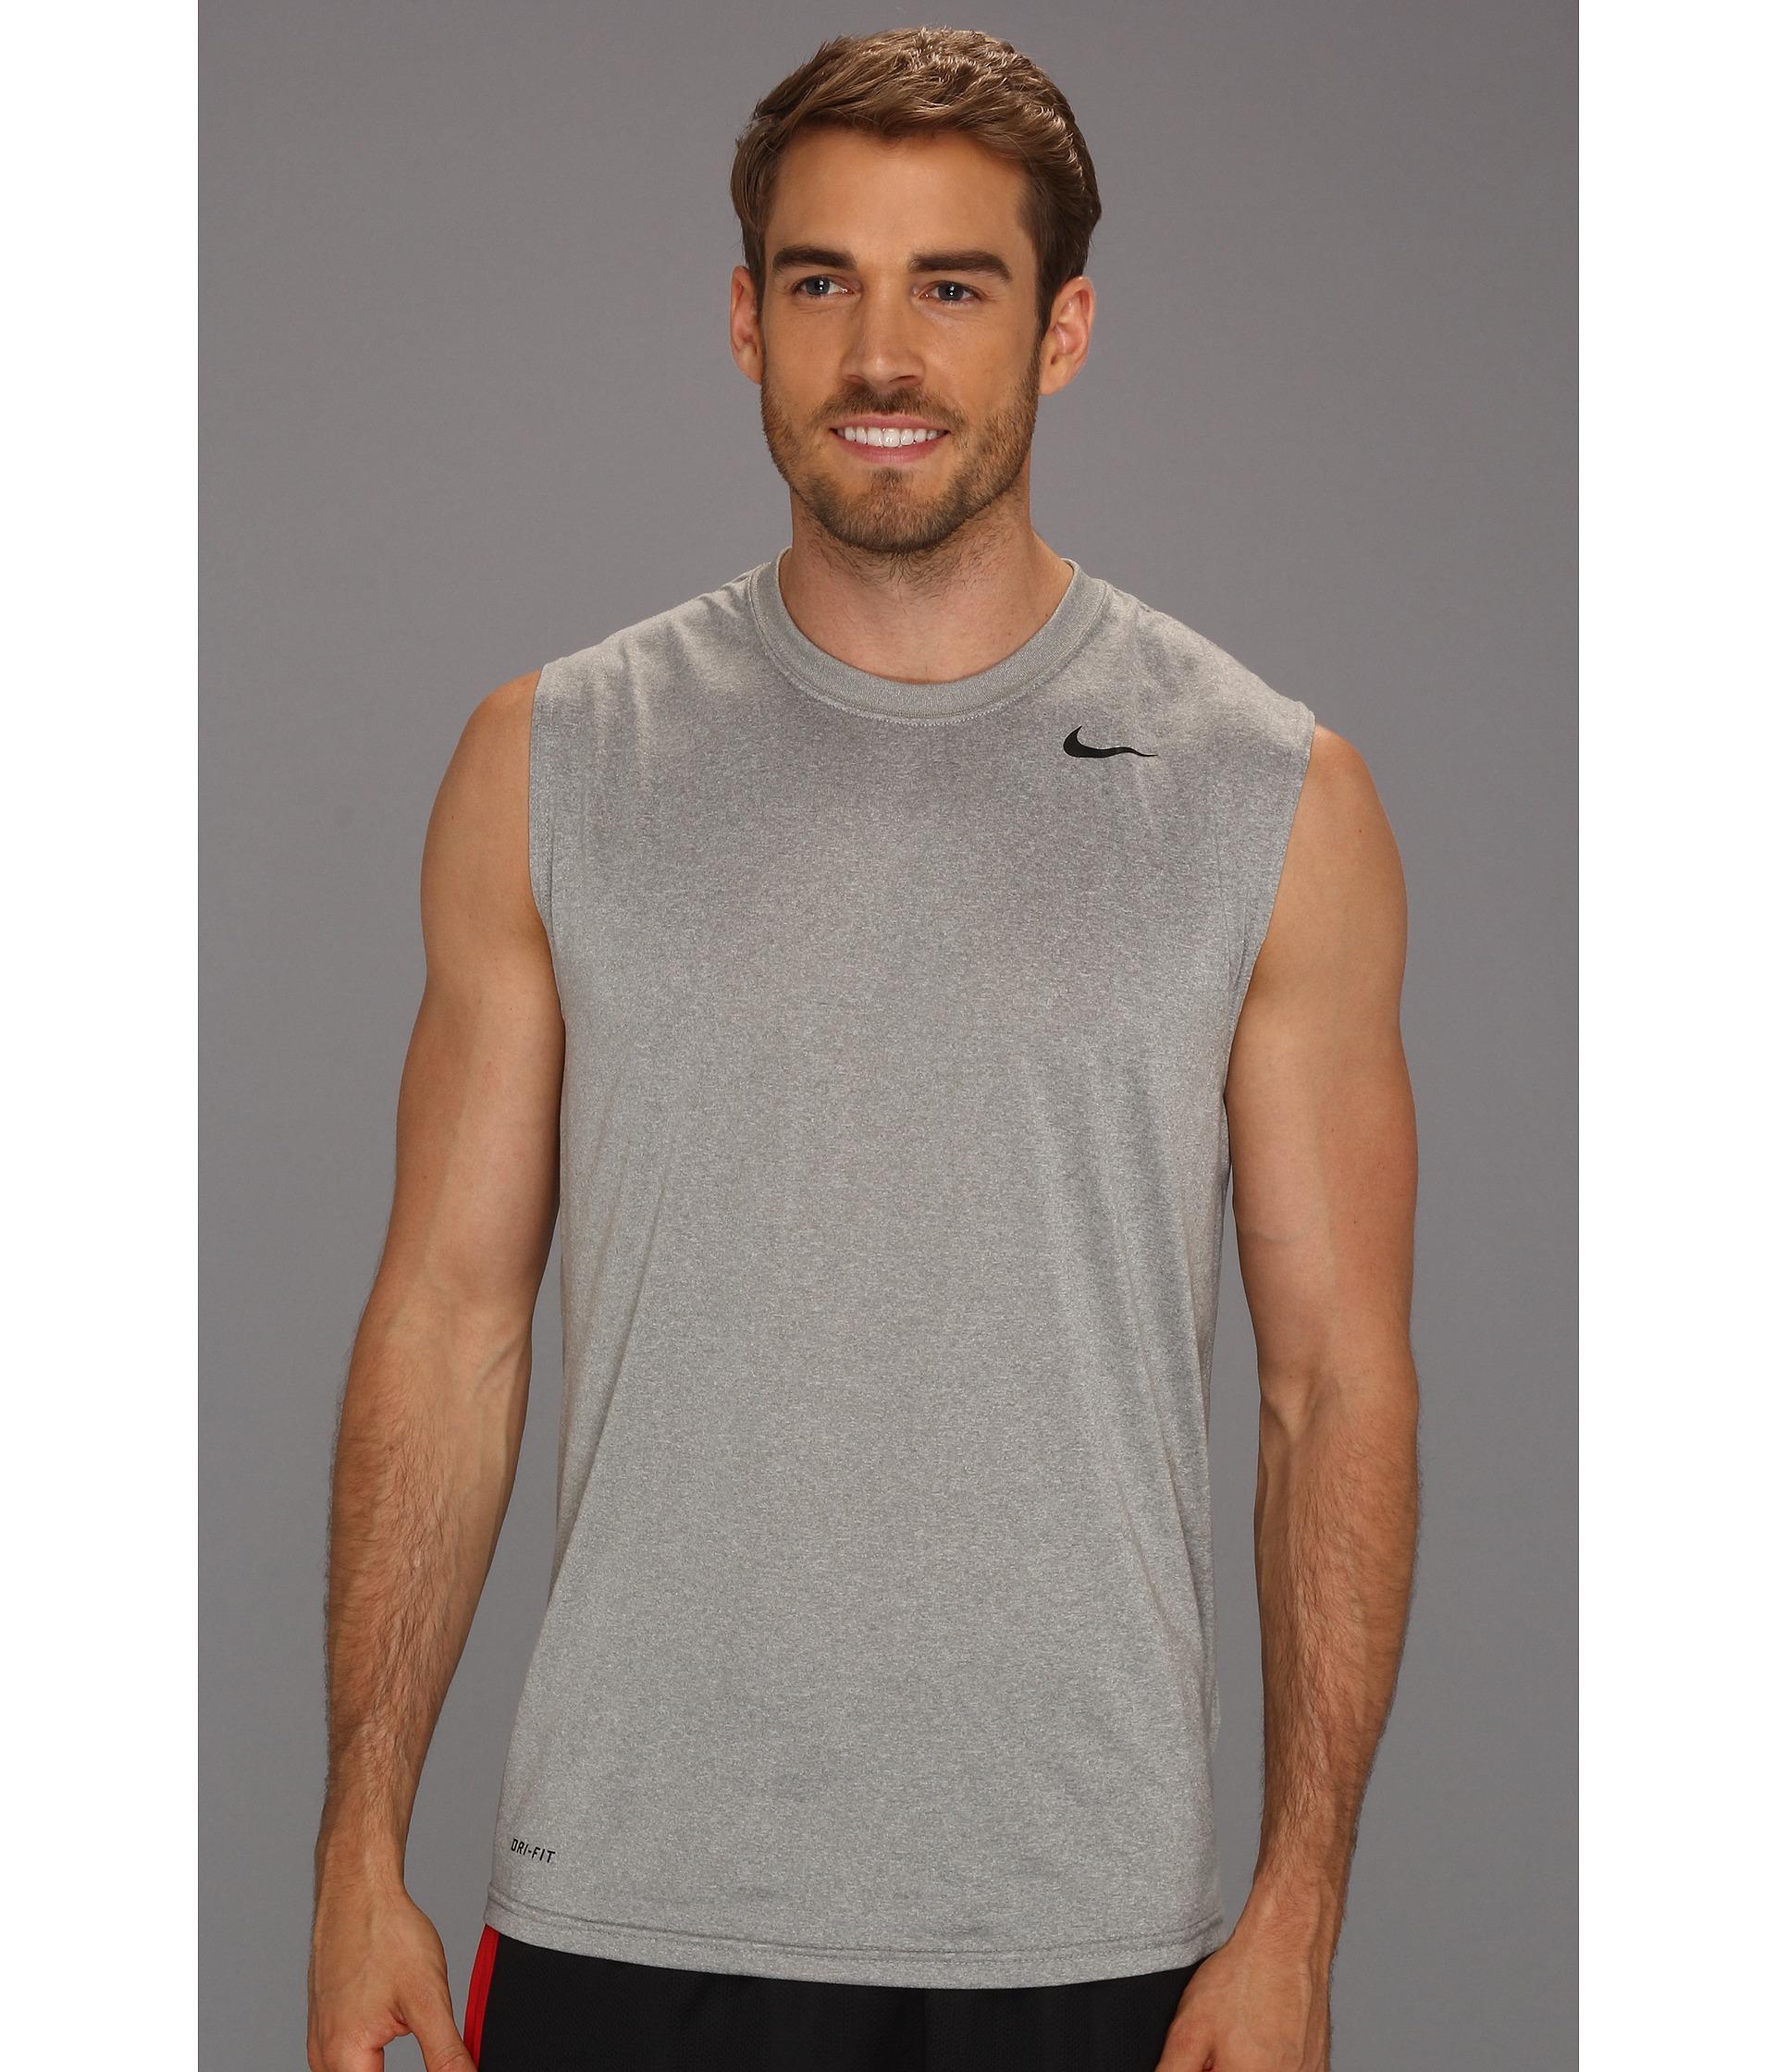 42c4a28d Nike Dri-Fit™ Legend Sleeveless Training Shirt in Gray for Men - Lyst